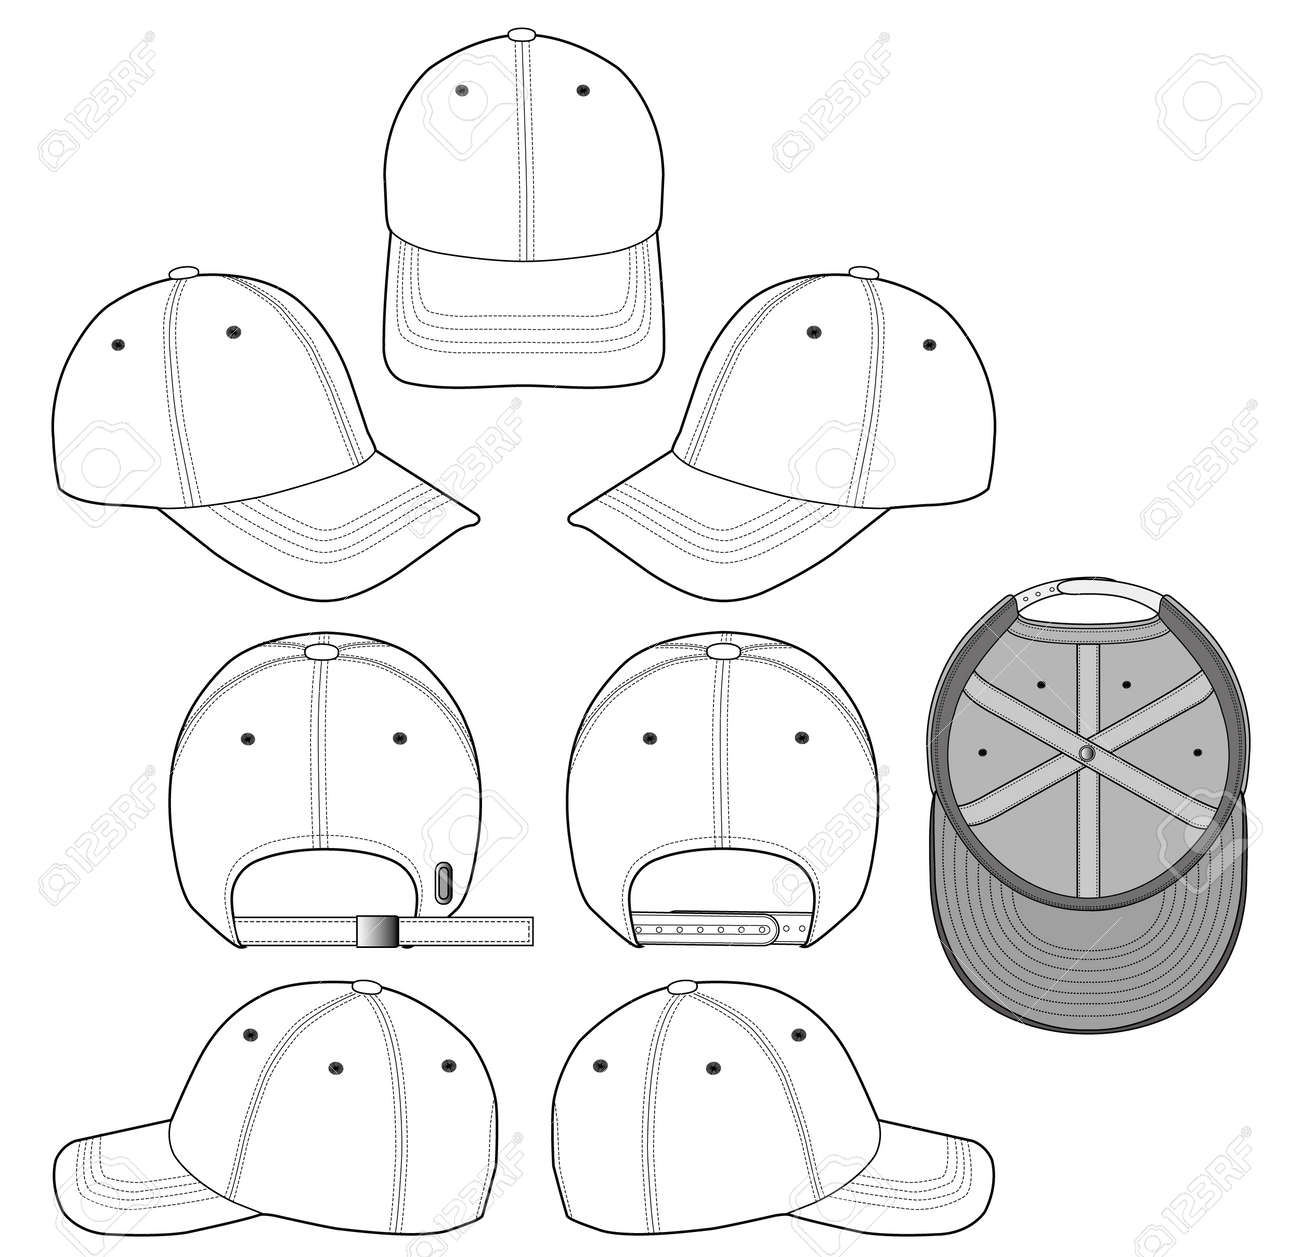 baseball cap vector illustration flat sketches template royalty free